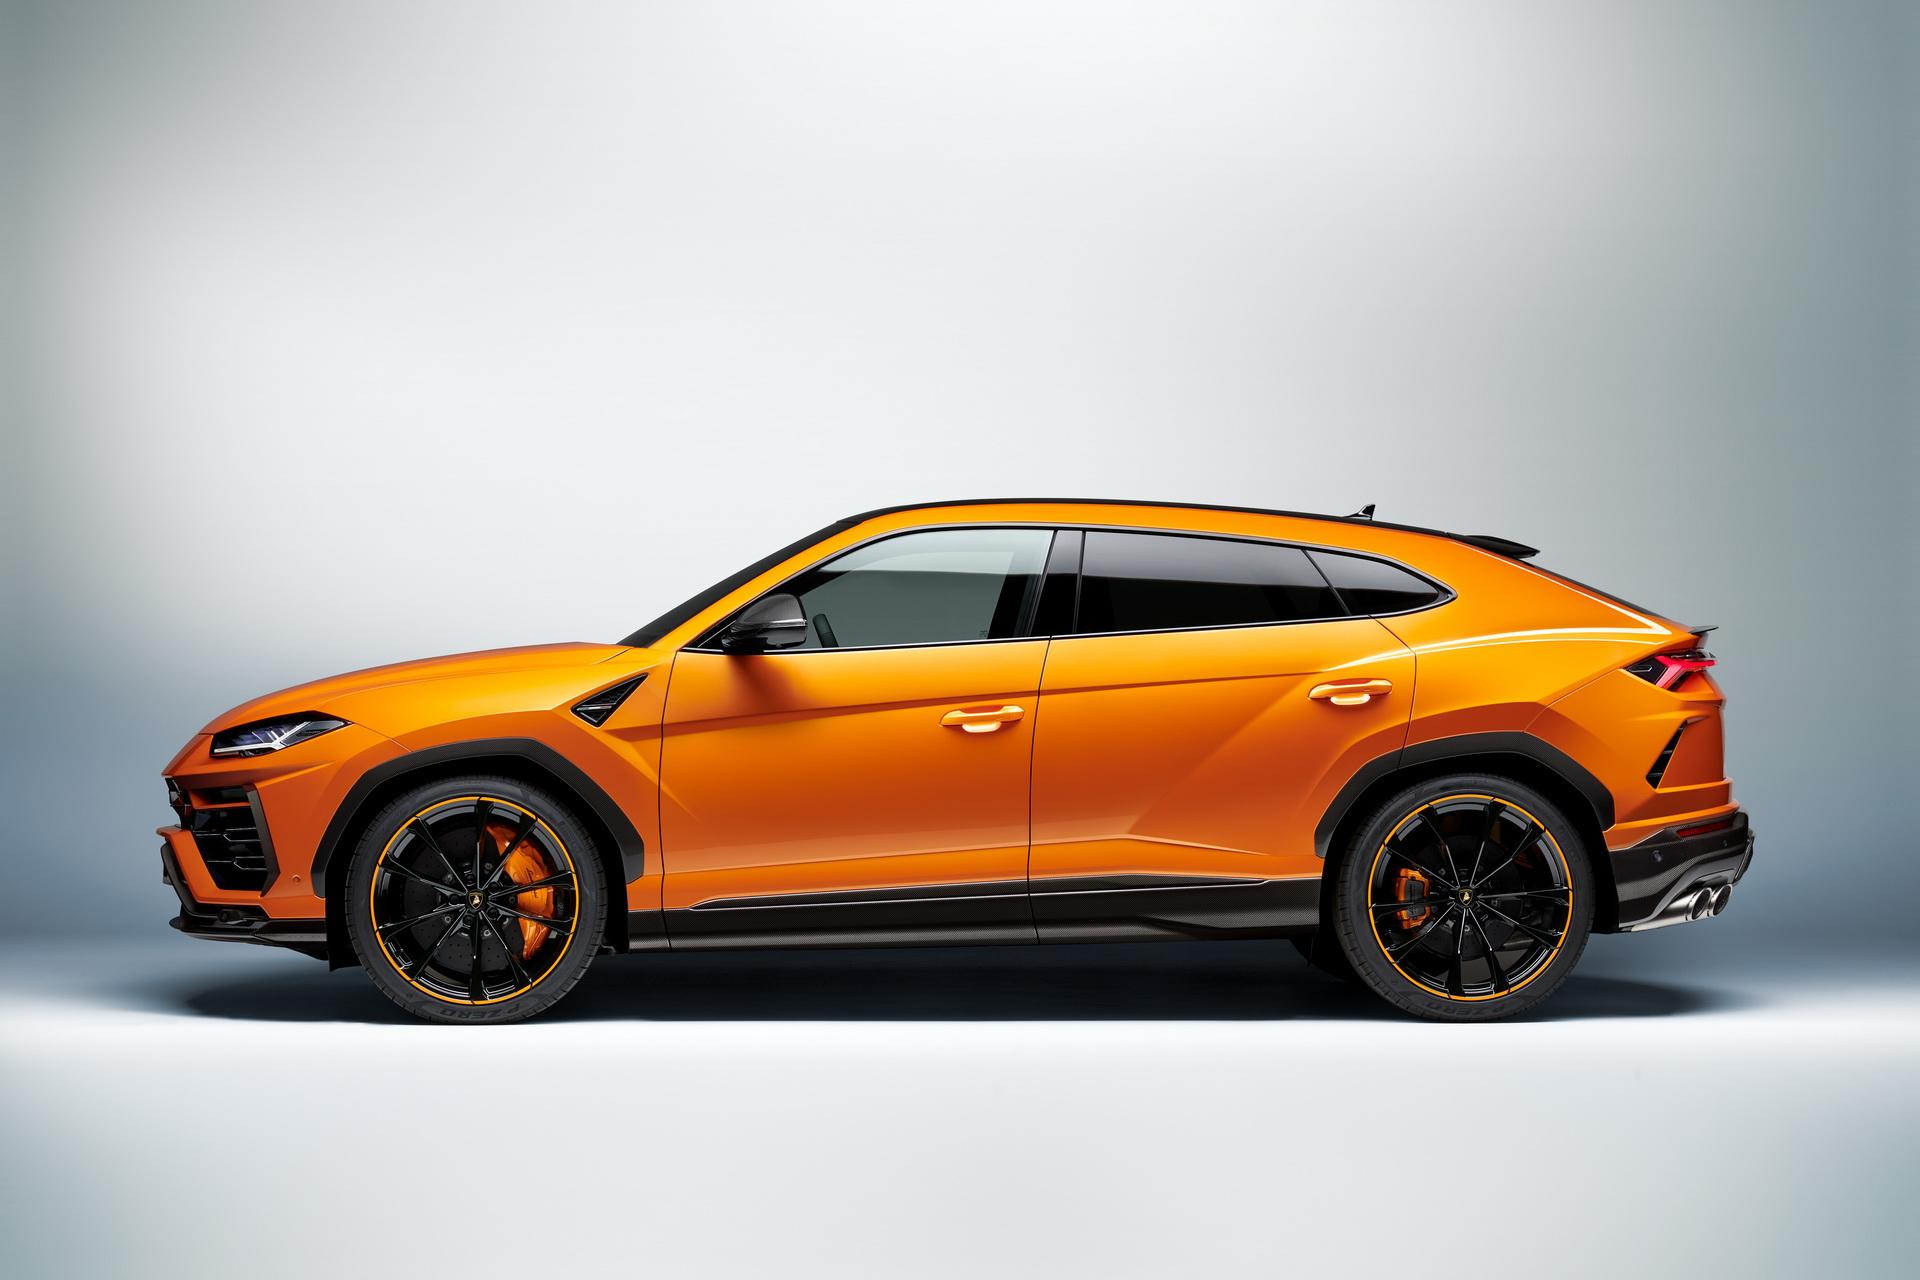 Lamborghini-Urus-Pearl-Capsule-Edition-15